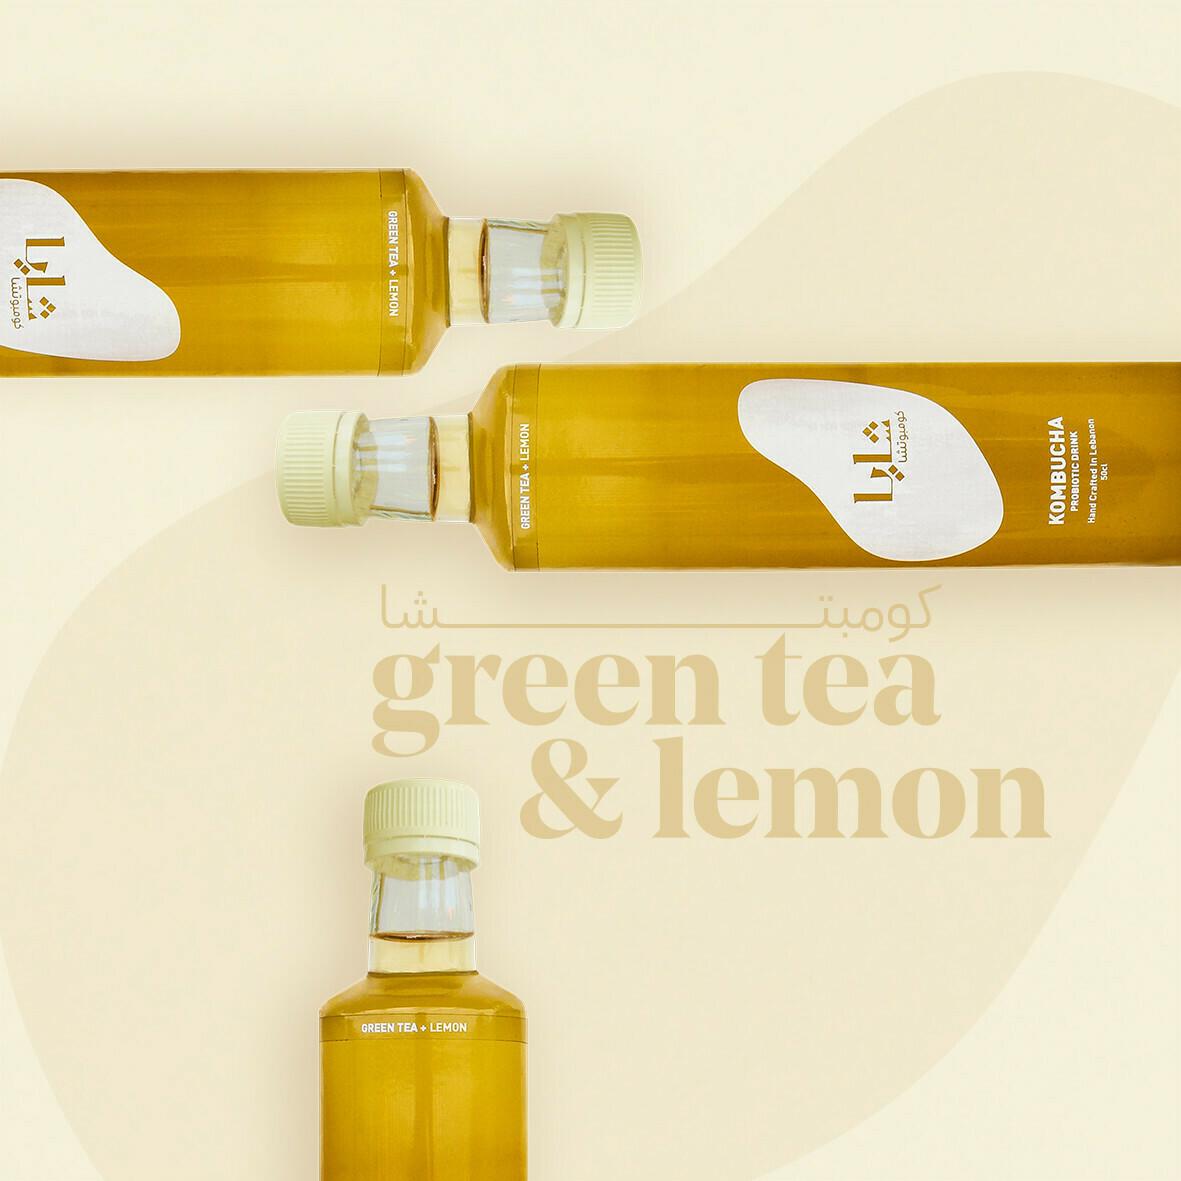 Kombucha Green Tea and Lemon (Bottle) - Shaya